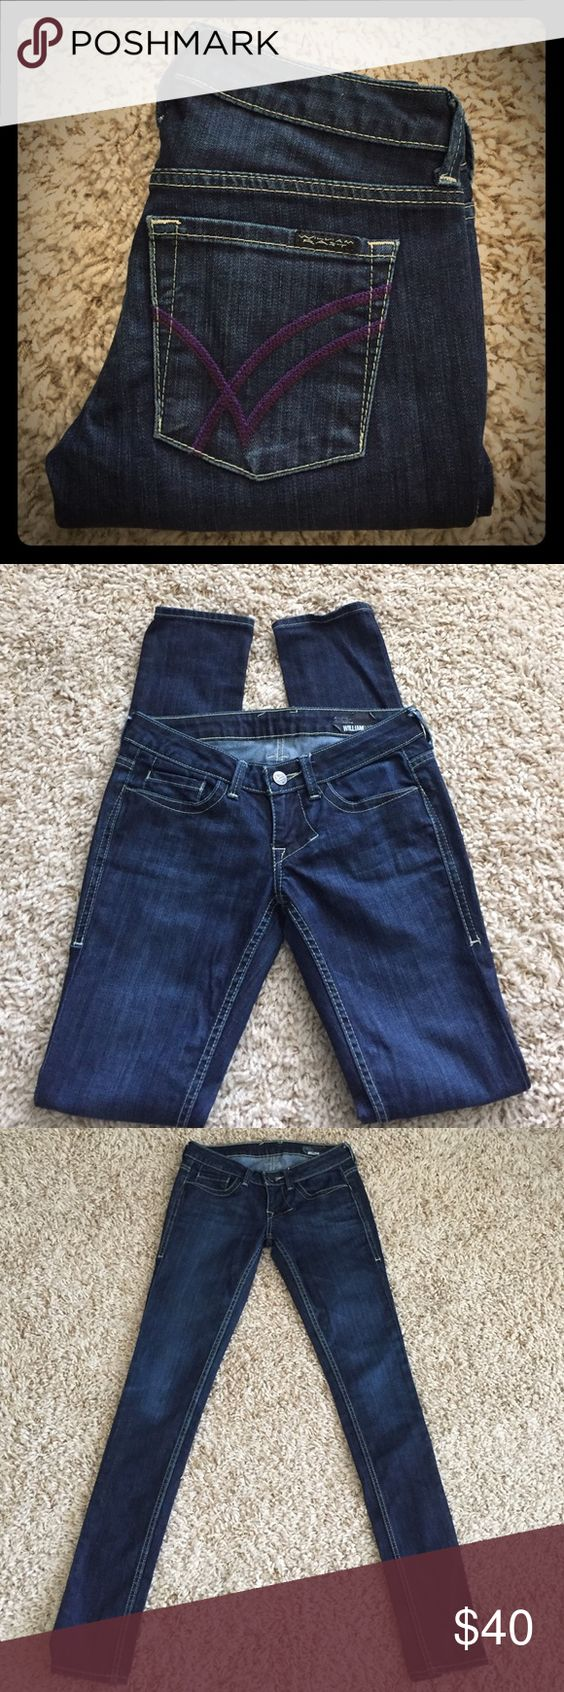 "William Rast skinny jeans Rad pair of William Rast skinny jeans in dark blue wash with signature W's stitched on back pockets in purple. Size 25, 33"" inseam William Rast Jeans Skinny"